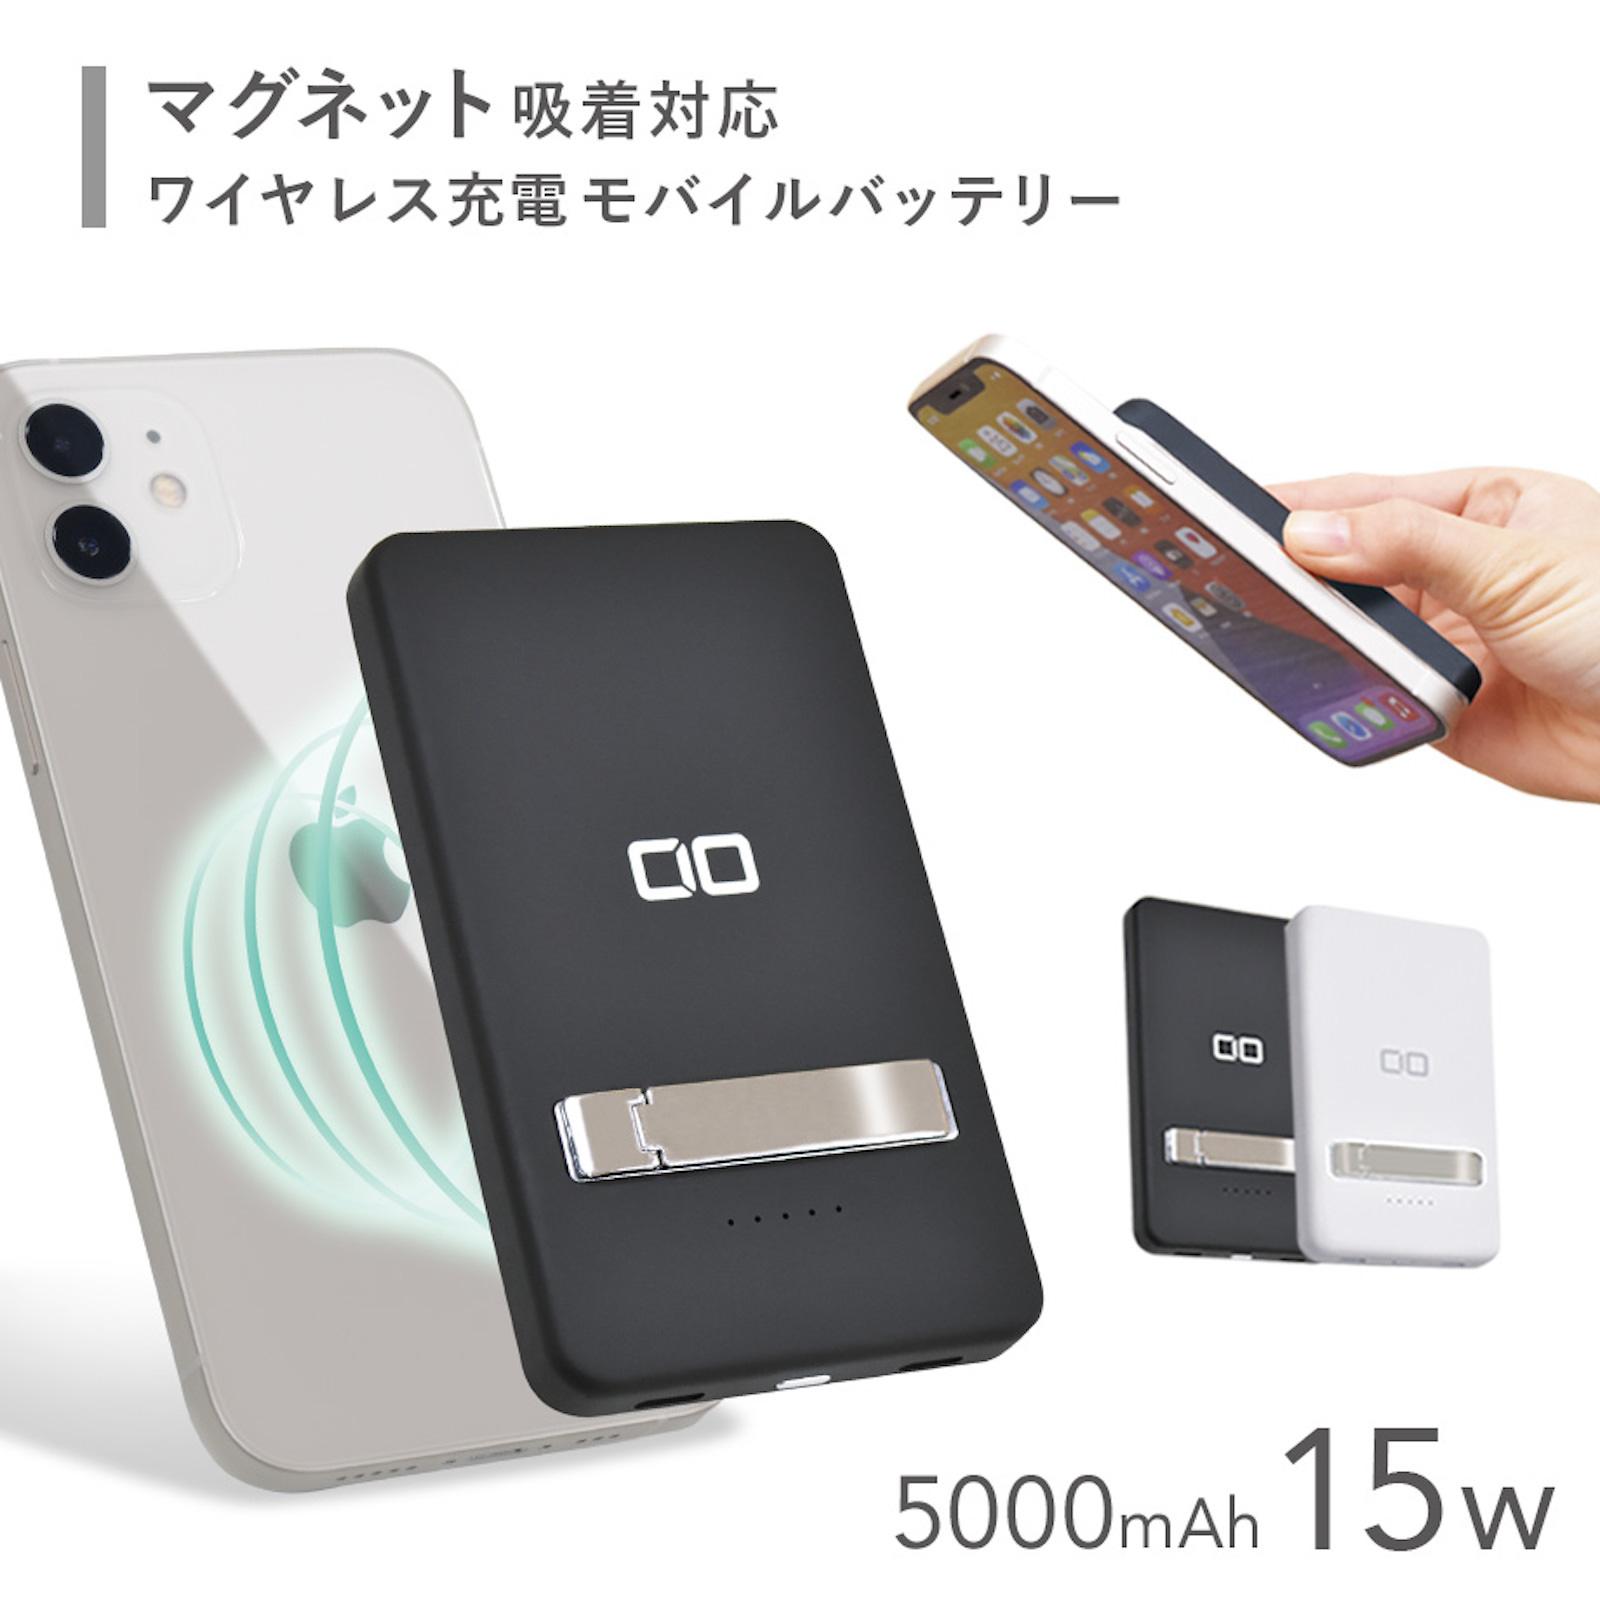 CIO MB5000 MAG 1